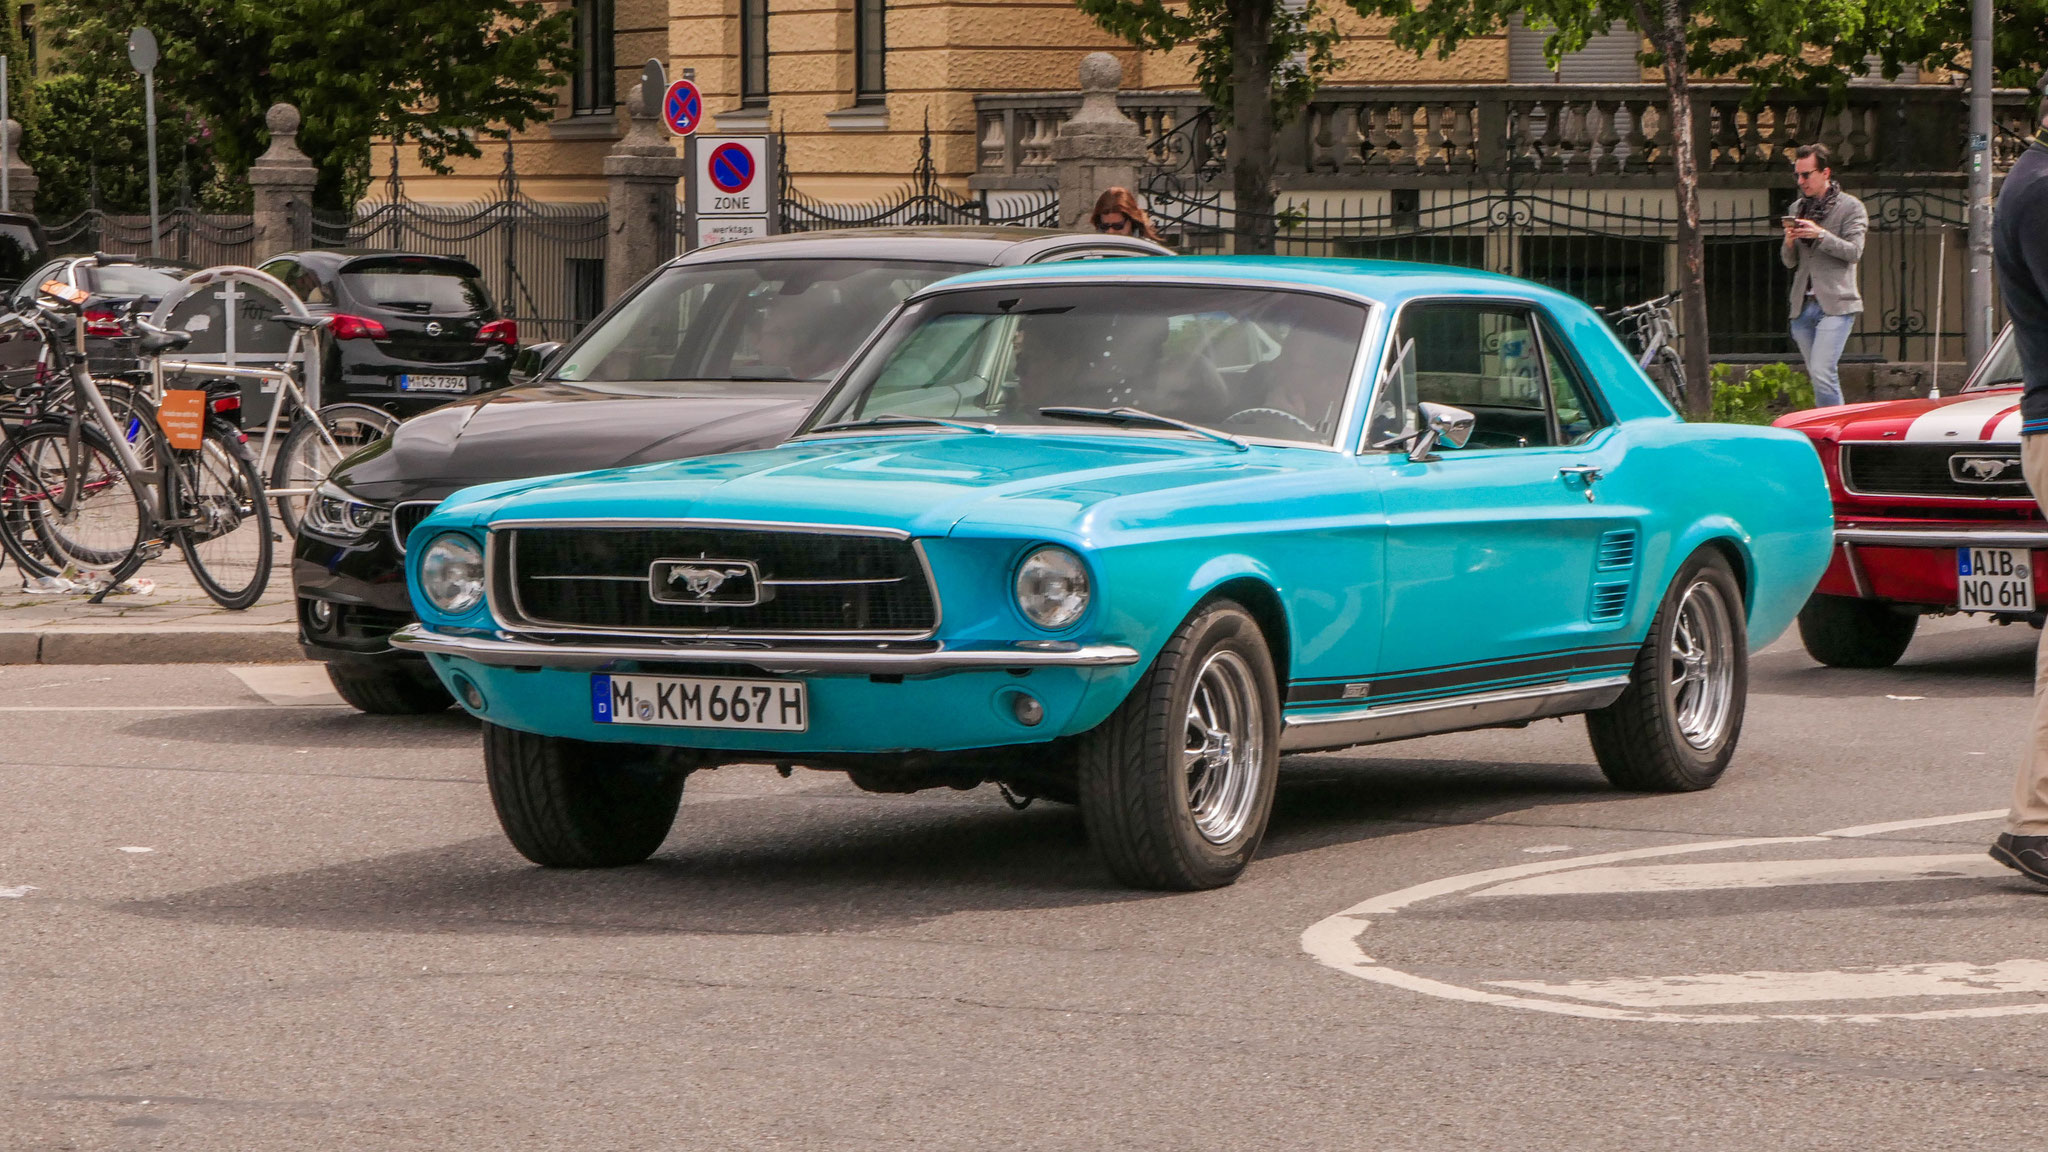 Mustang I - M-KM-667H